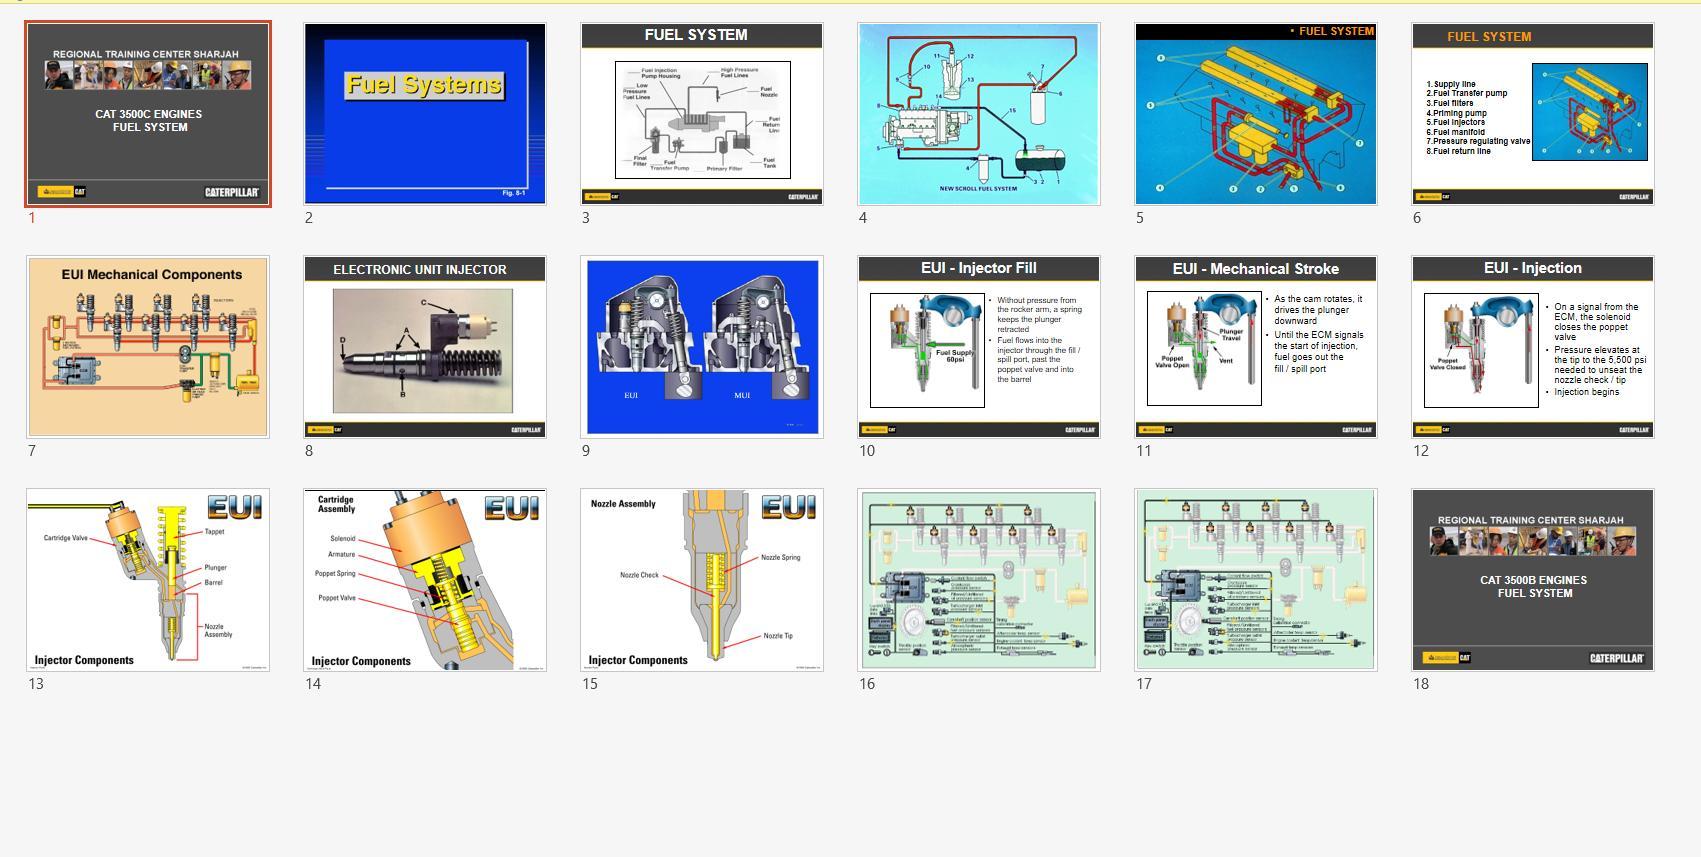 CAT_Marine_Engine_Service_Training_CD10